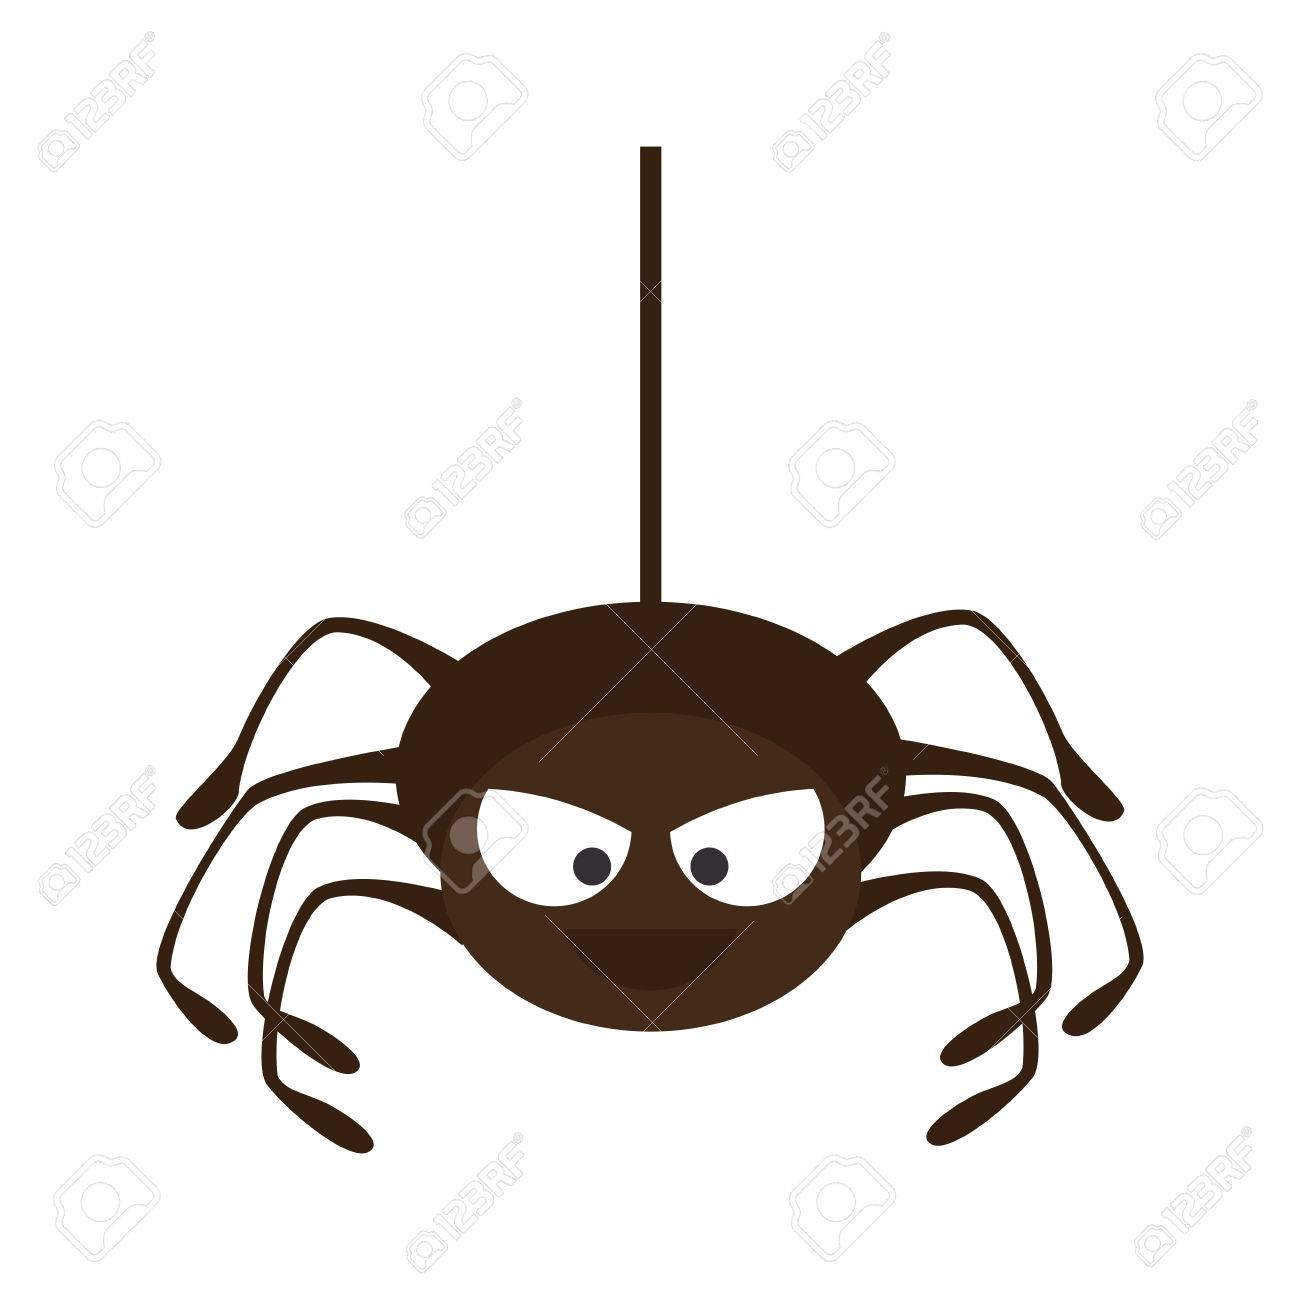 Spyder En Animales Aracnidos Arana Halloween Ilustracion De Dibujos - Dibujos-araas-halloween